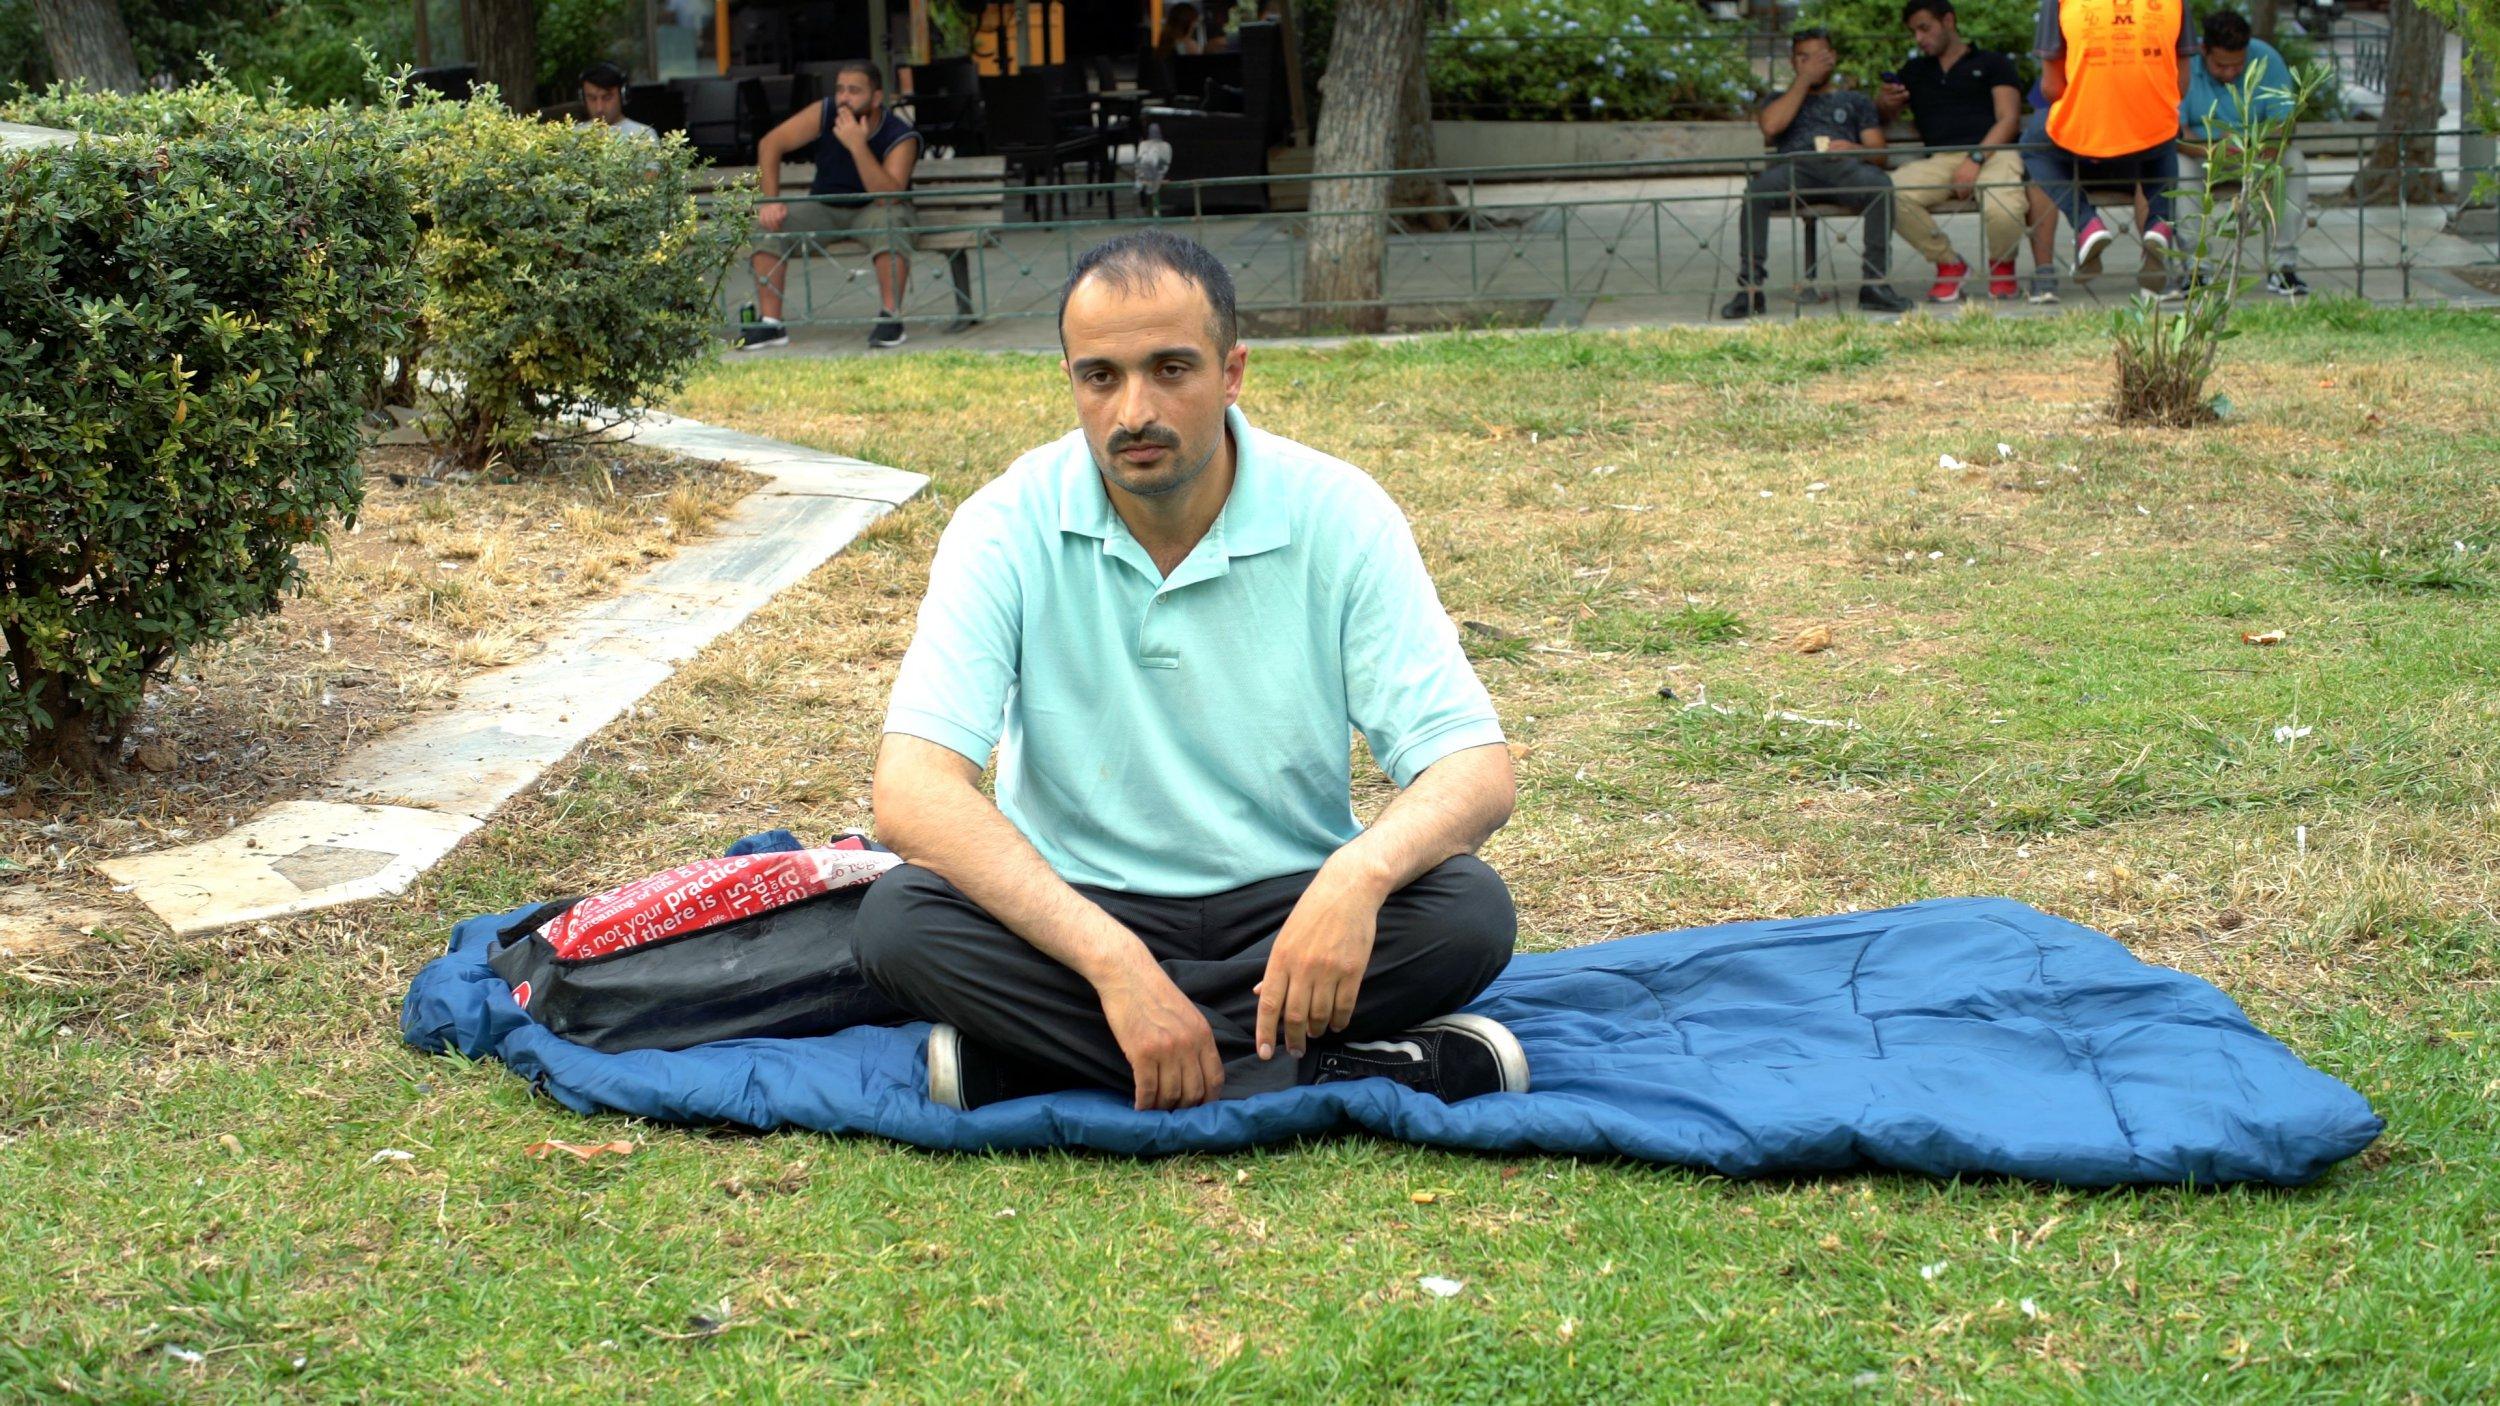 130,000 back petition to help Afghan interpreter sleeping rough after being denied UK visa